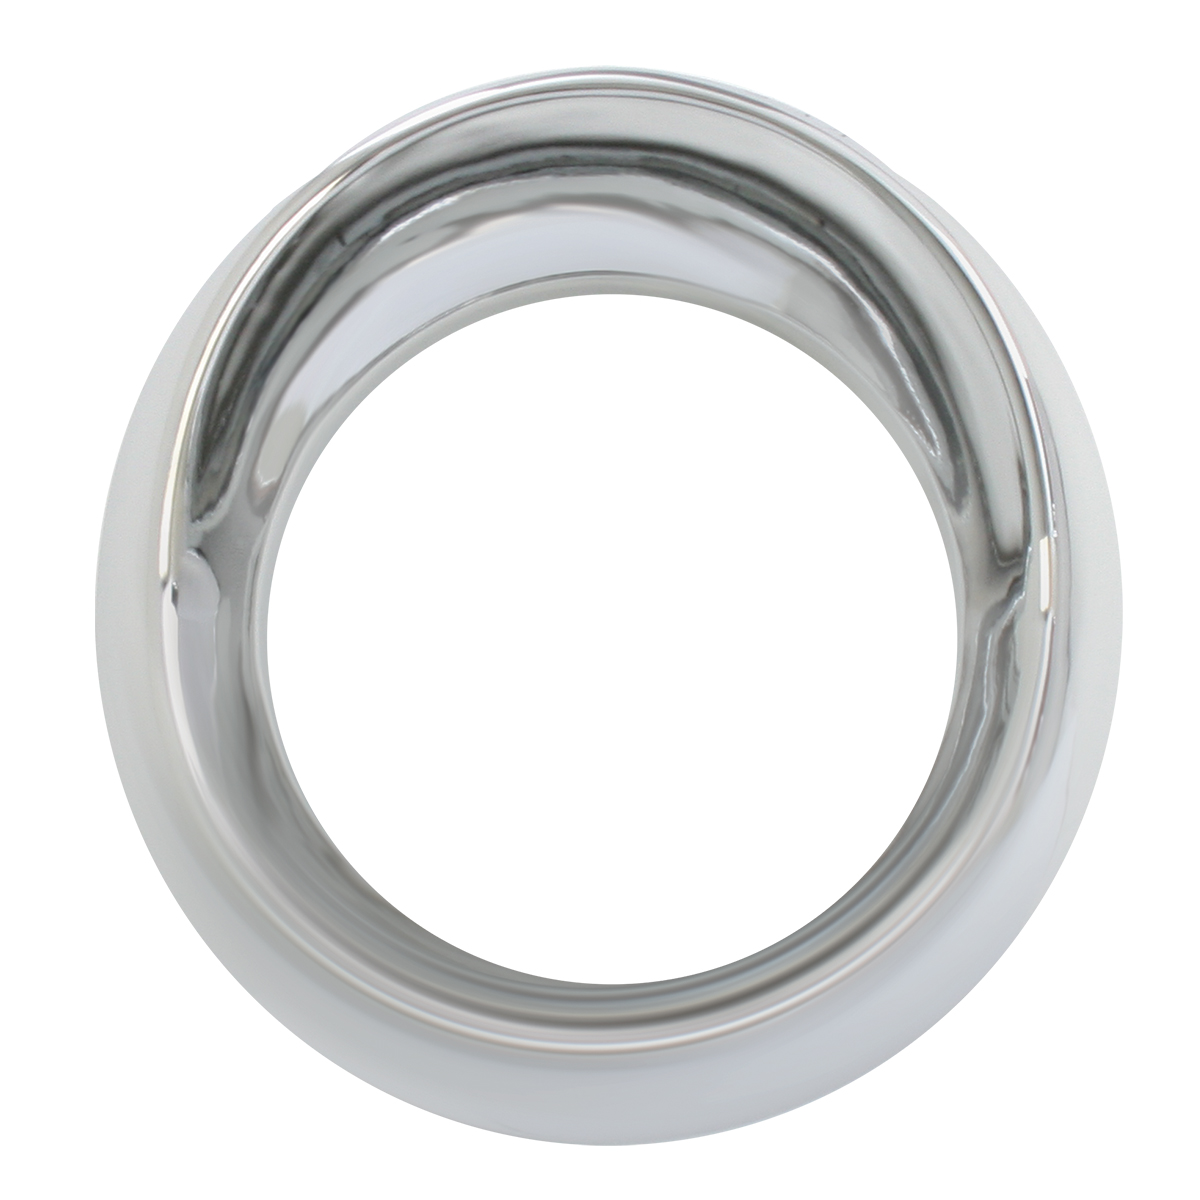 68223 Chrome Plastic Small Snap-On Gauge Cover w/ Visor for KW